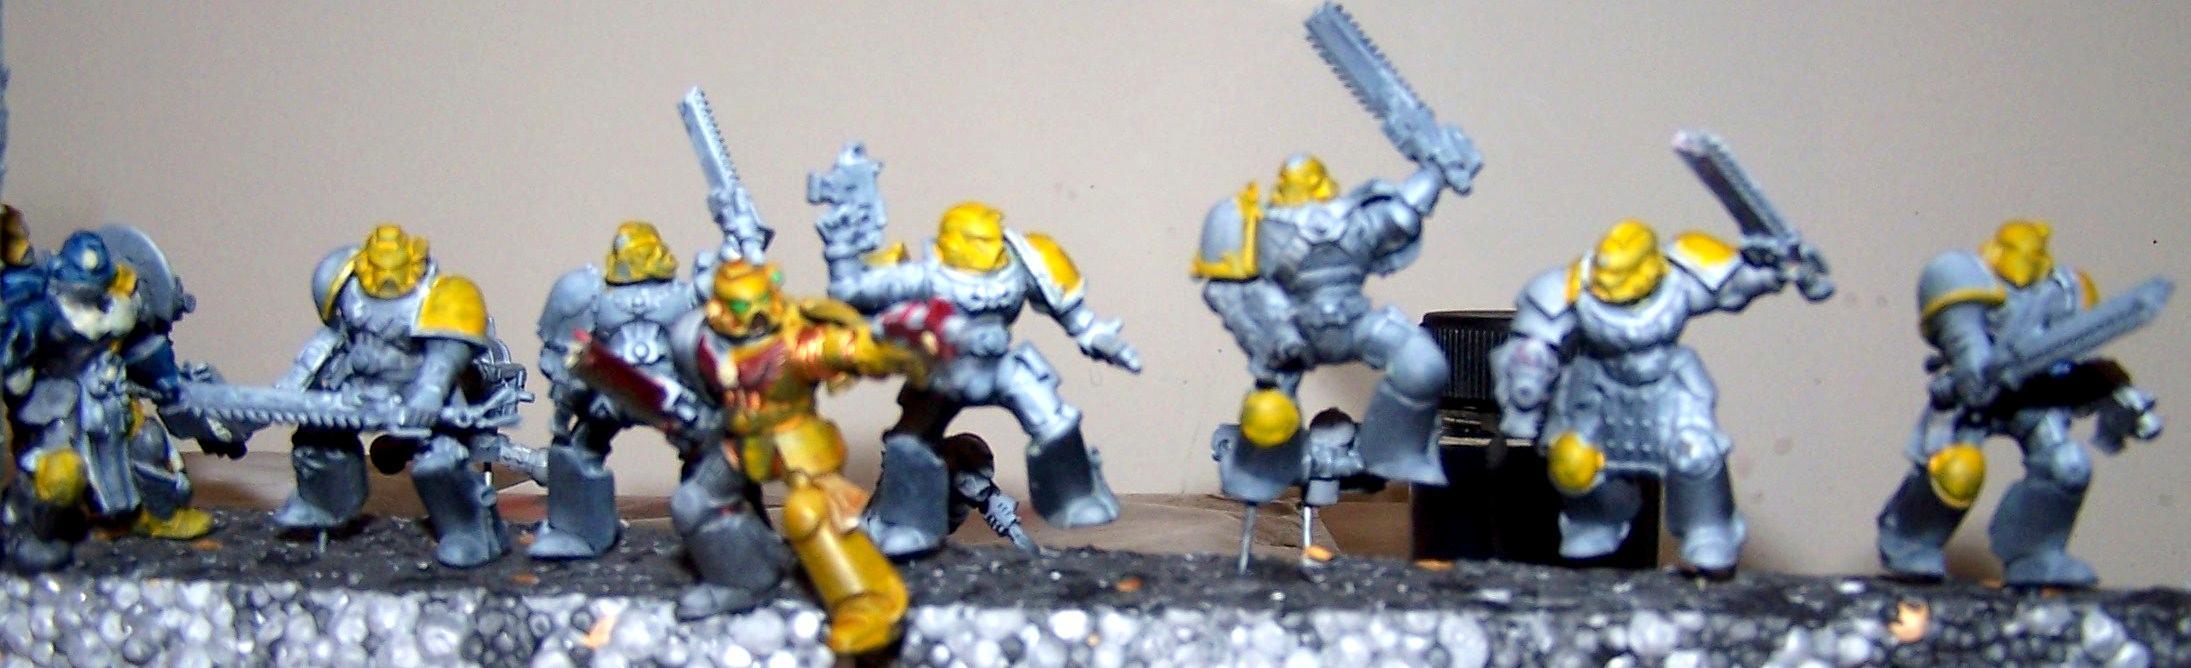 Silvermk2, True Scale, Warp Dragons, Work In Progress